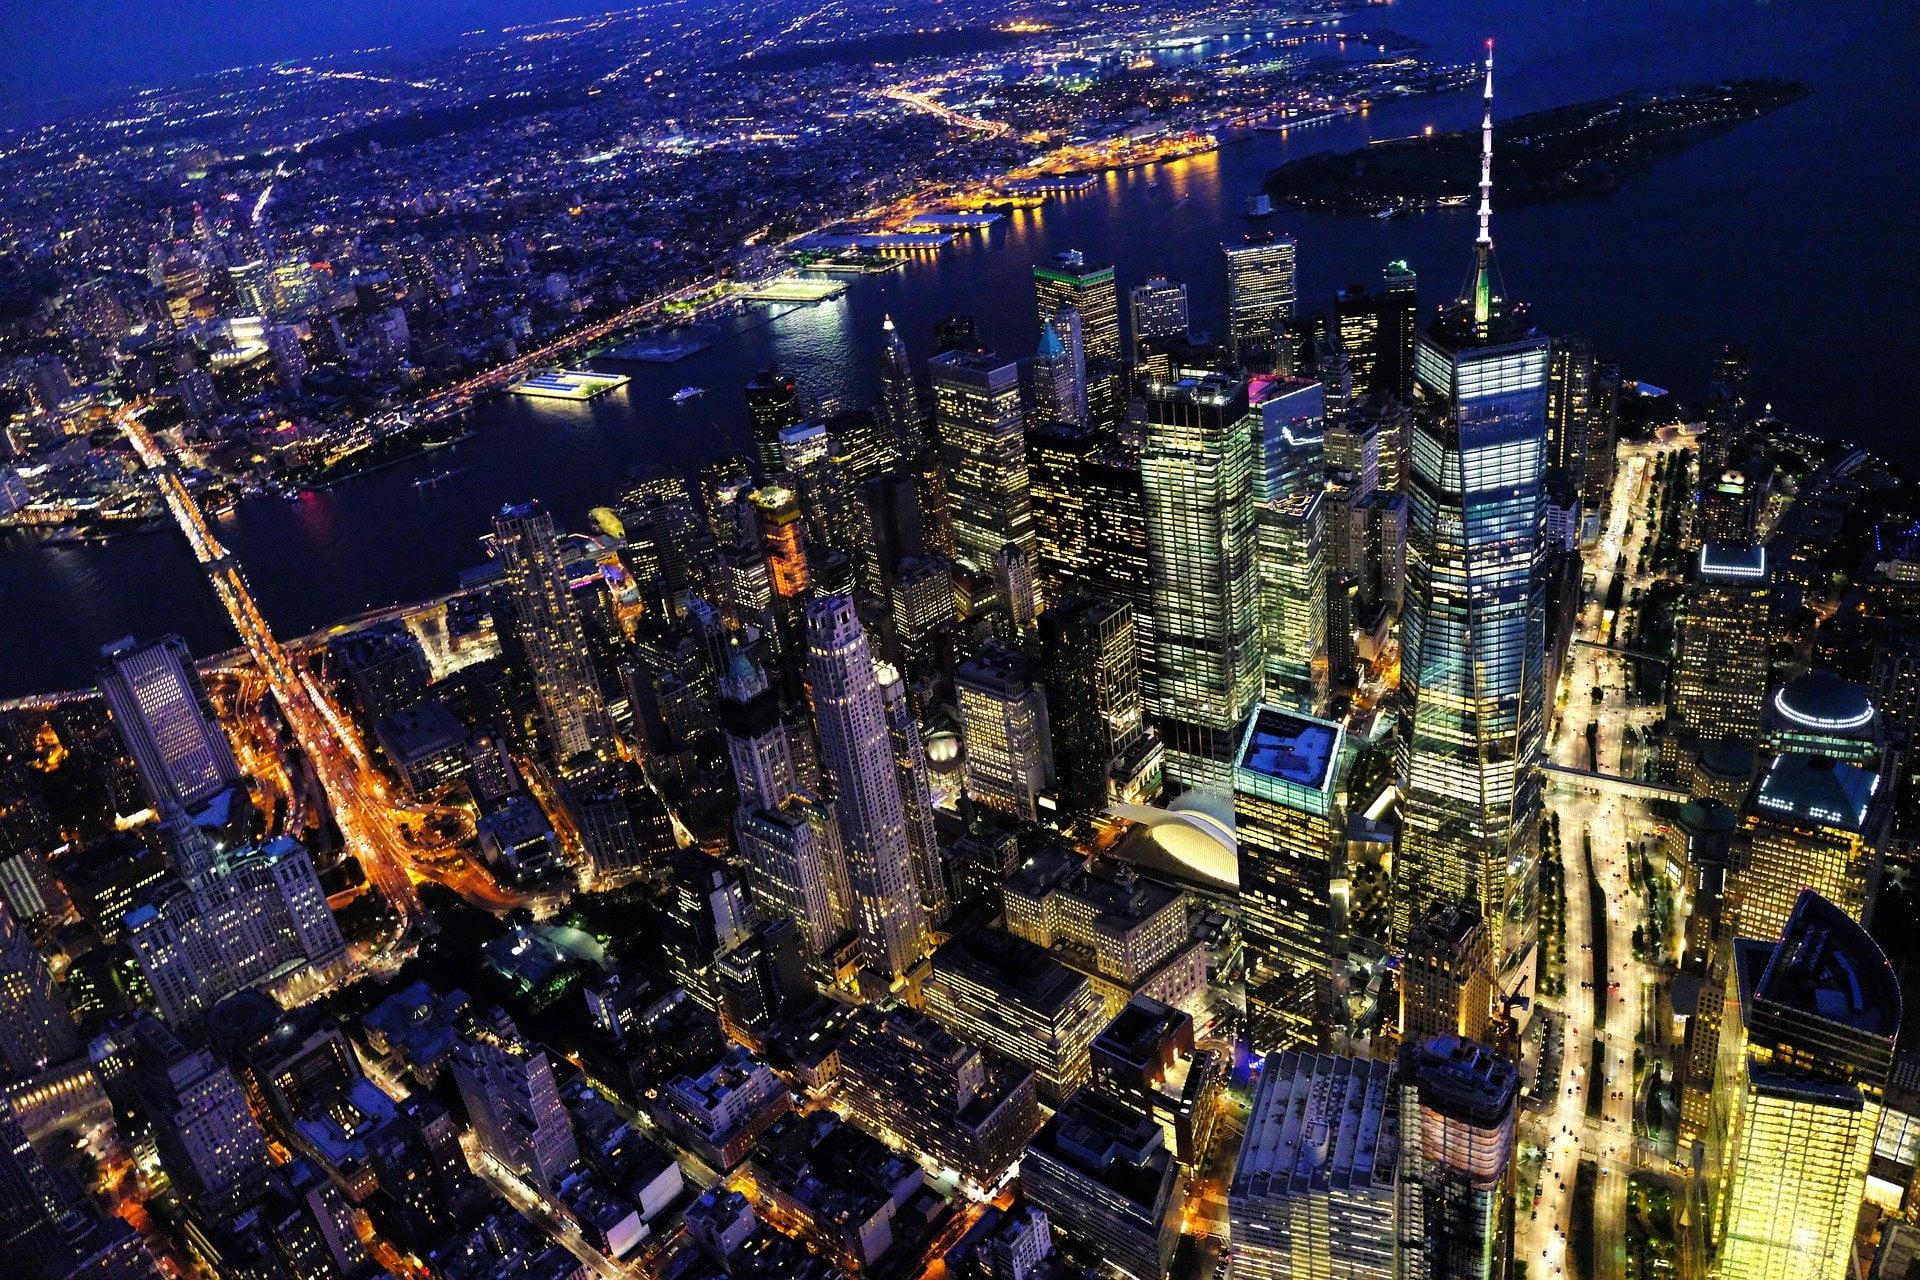 New York City at night - photo by igormattio from Pixabay under Pixabay License